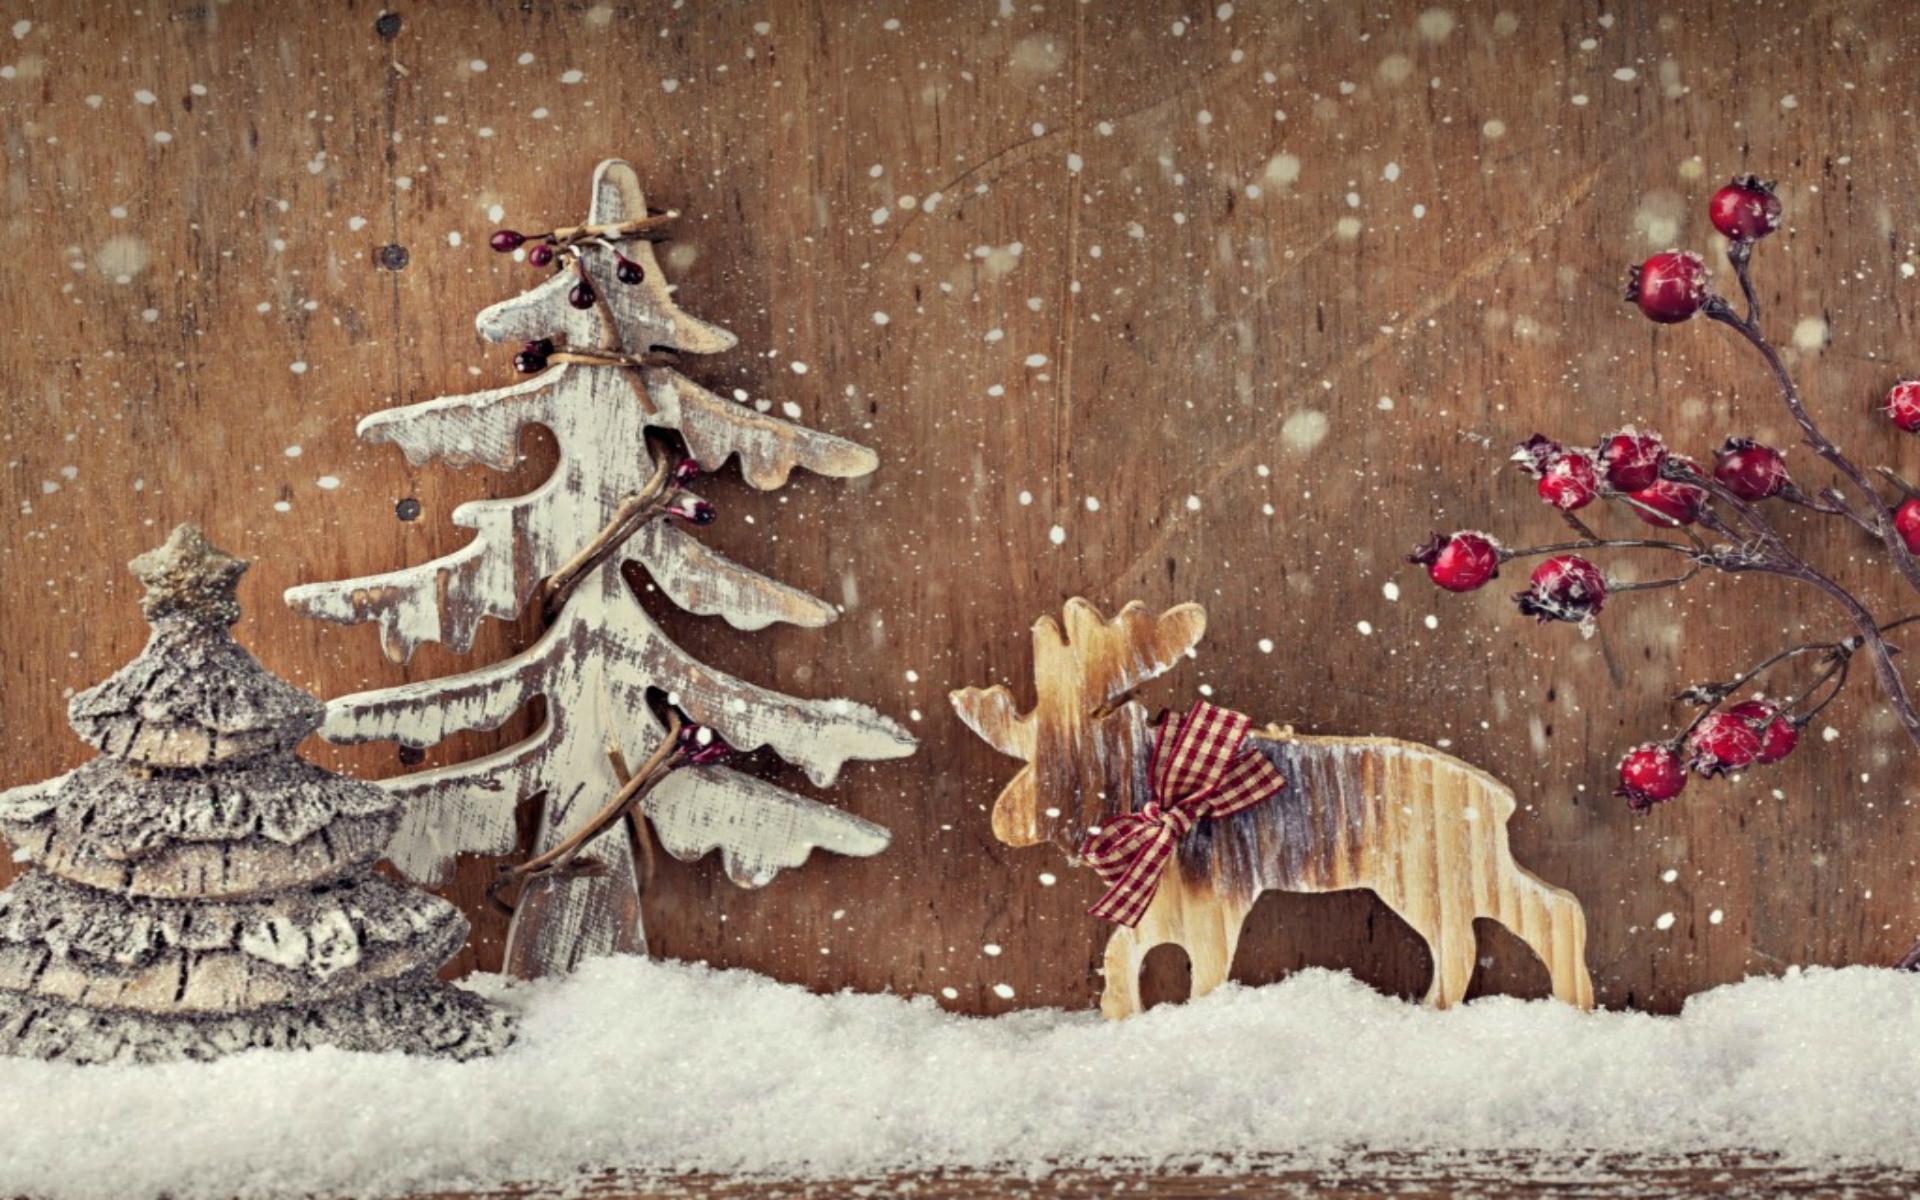 19 Hd Christmas Wallpapers & Desktop Backgrounds